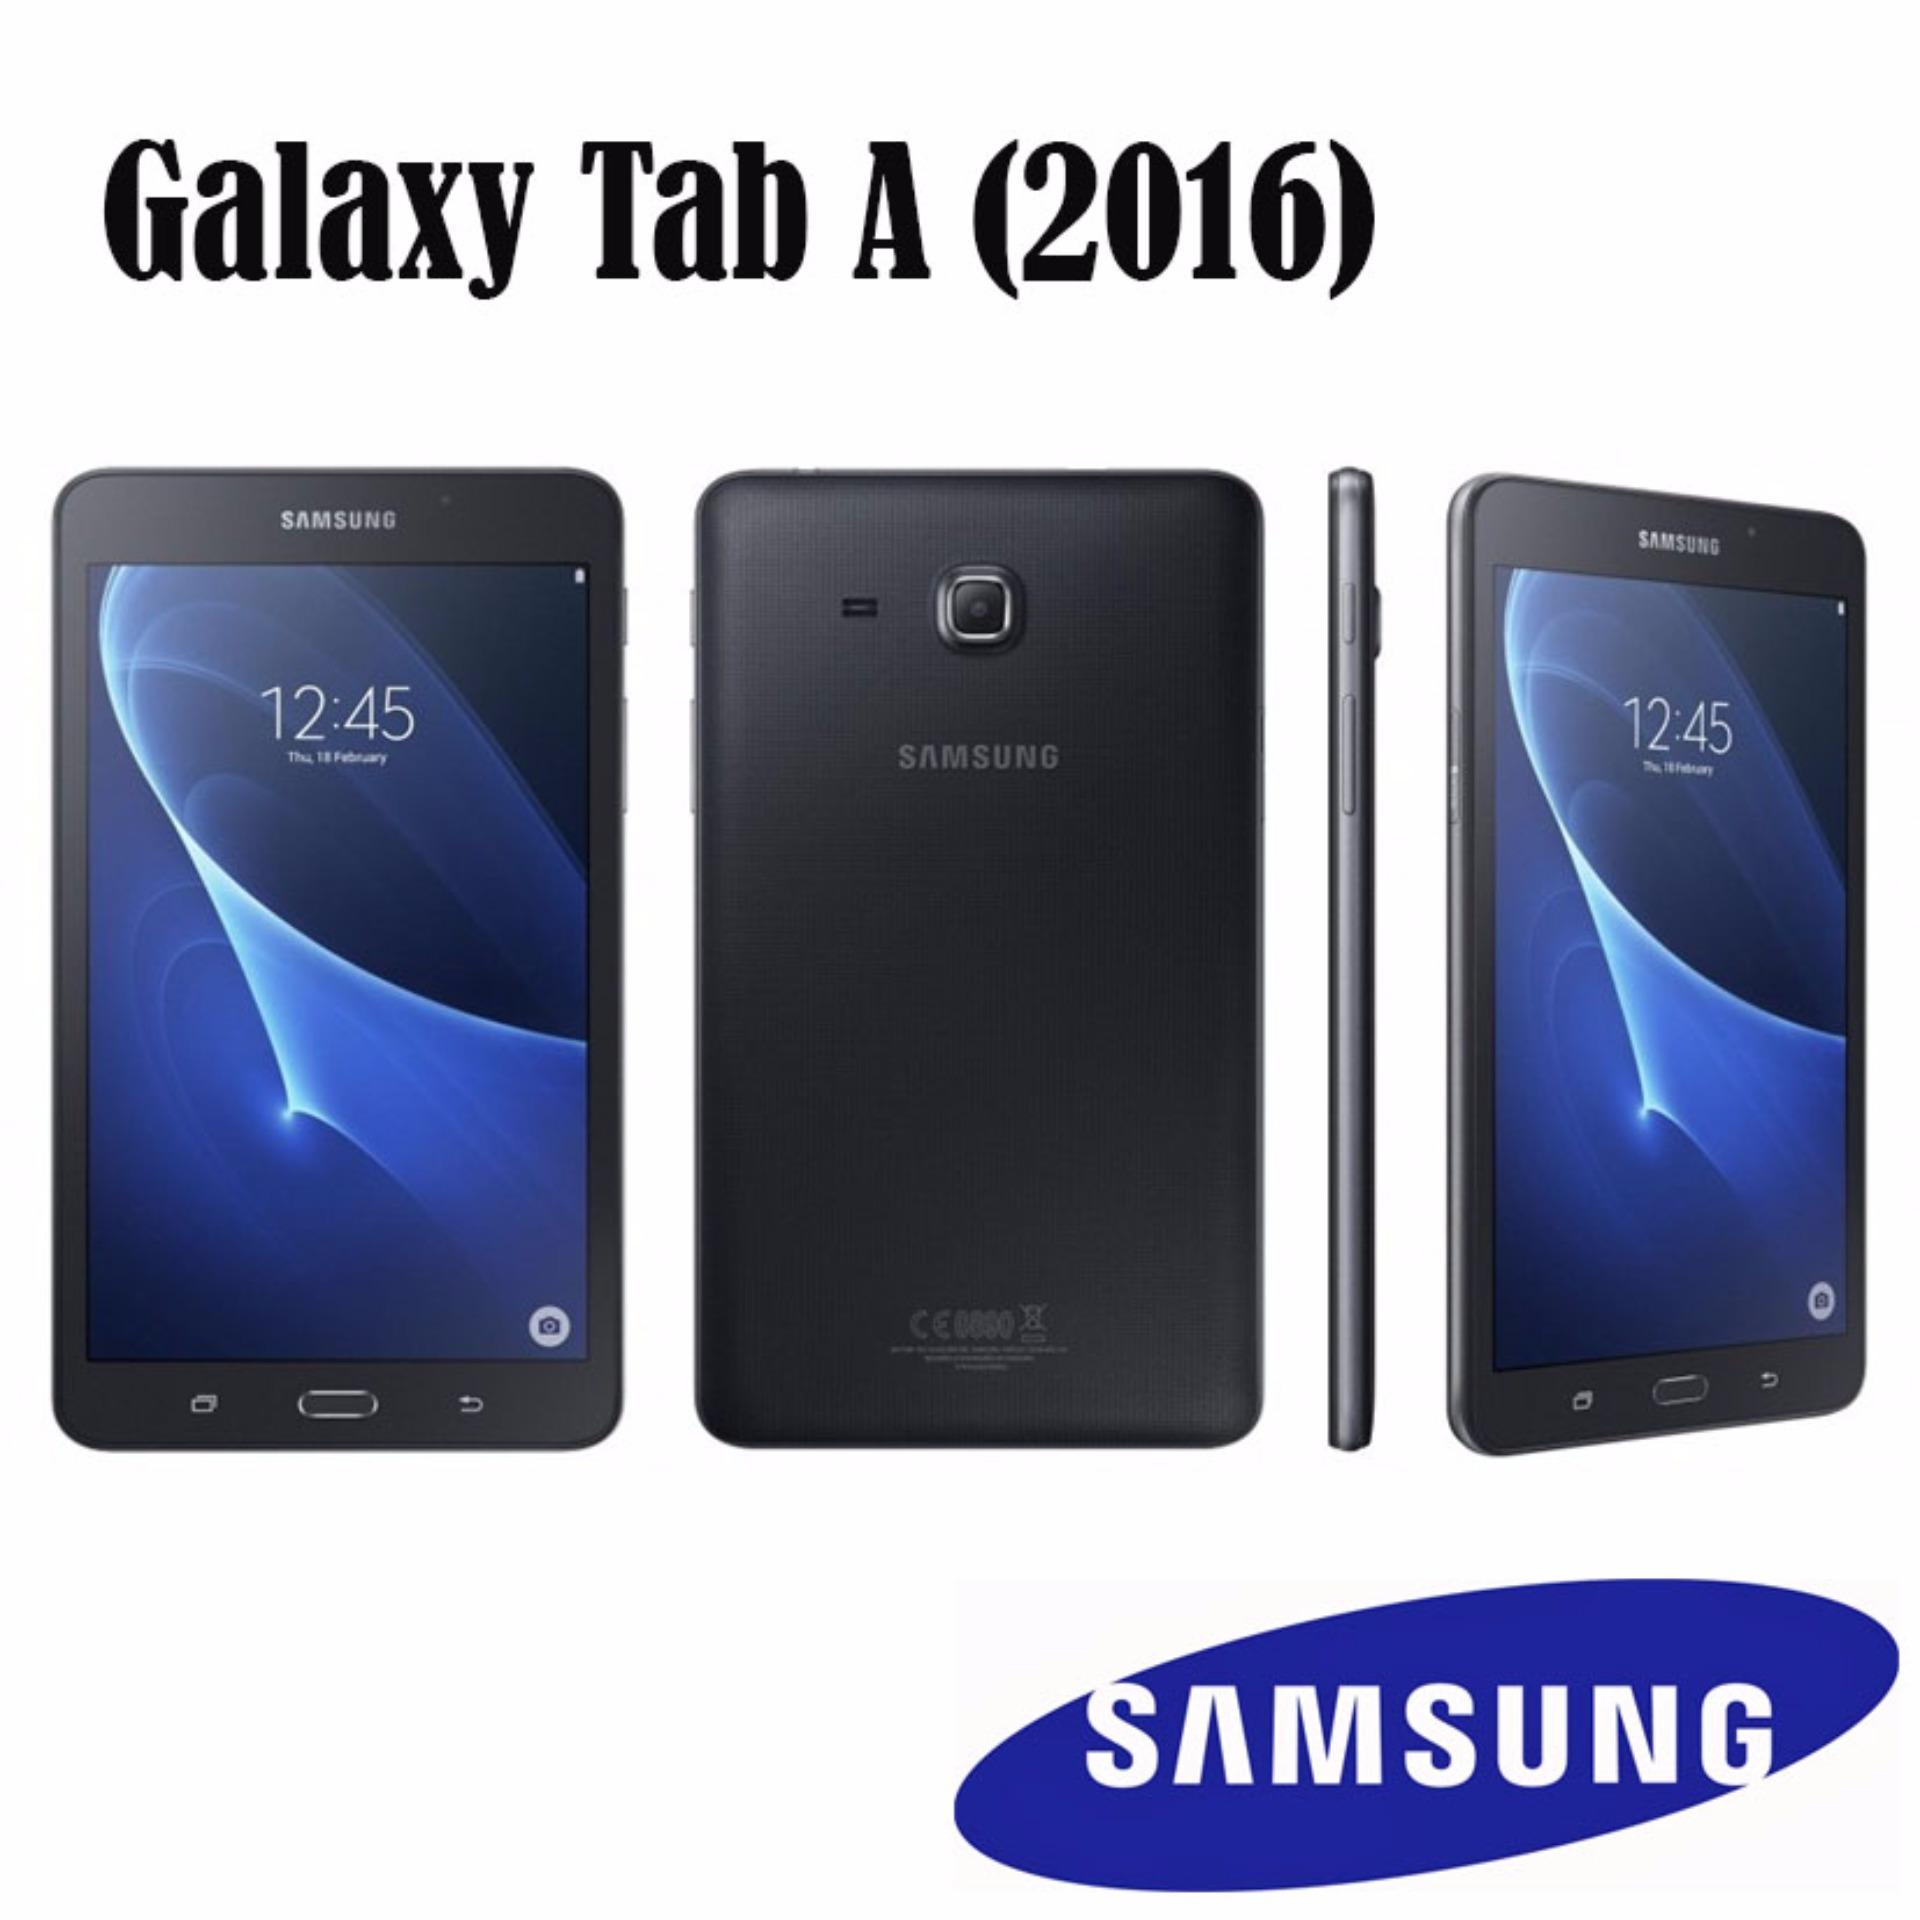 Samsung Galaxy Tab A 7.0 (2016) / T285 / 8 GB ROM / 1.5 GB RAM / Export set / 1mth Warranty